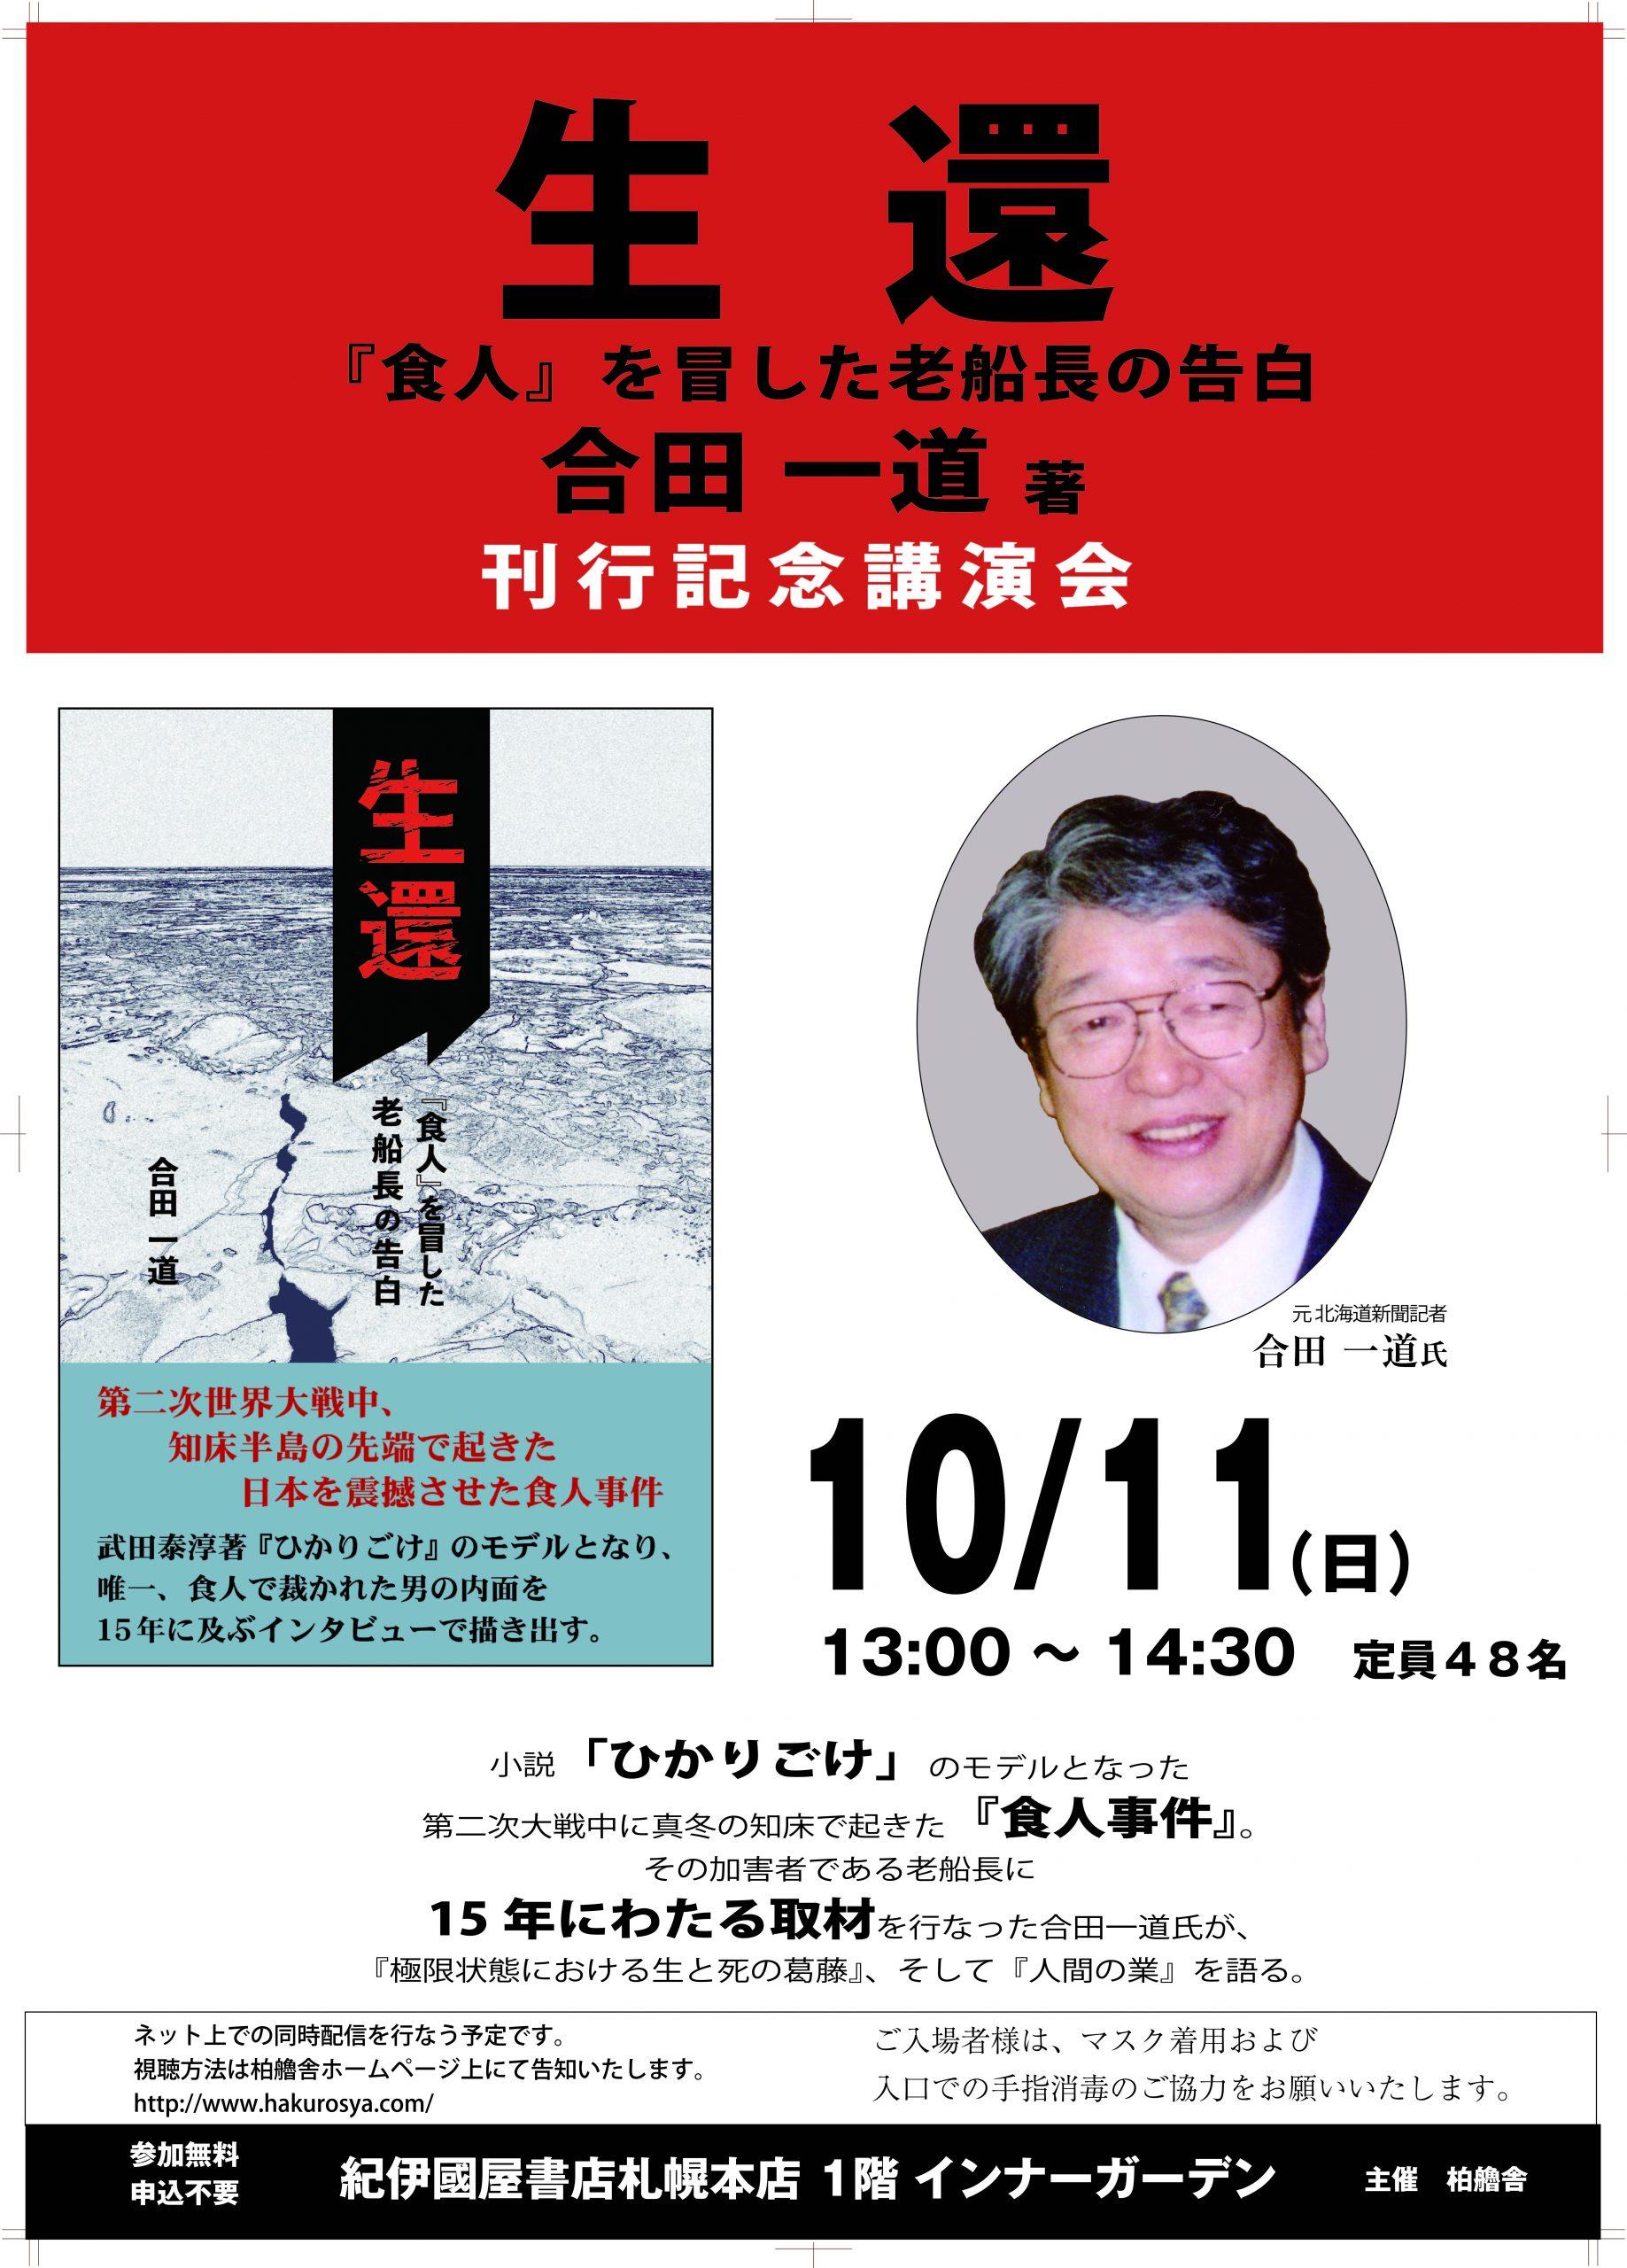 紀伊國屋書店:-生還-   『食人』を冒した老船長の告白 刊行記念講演会